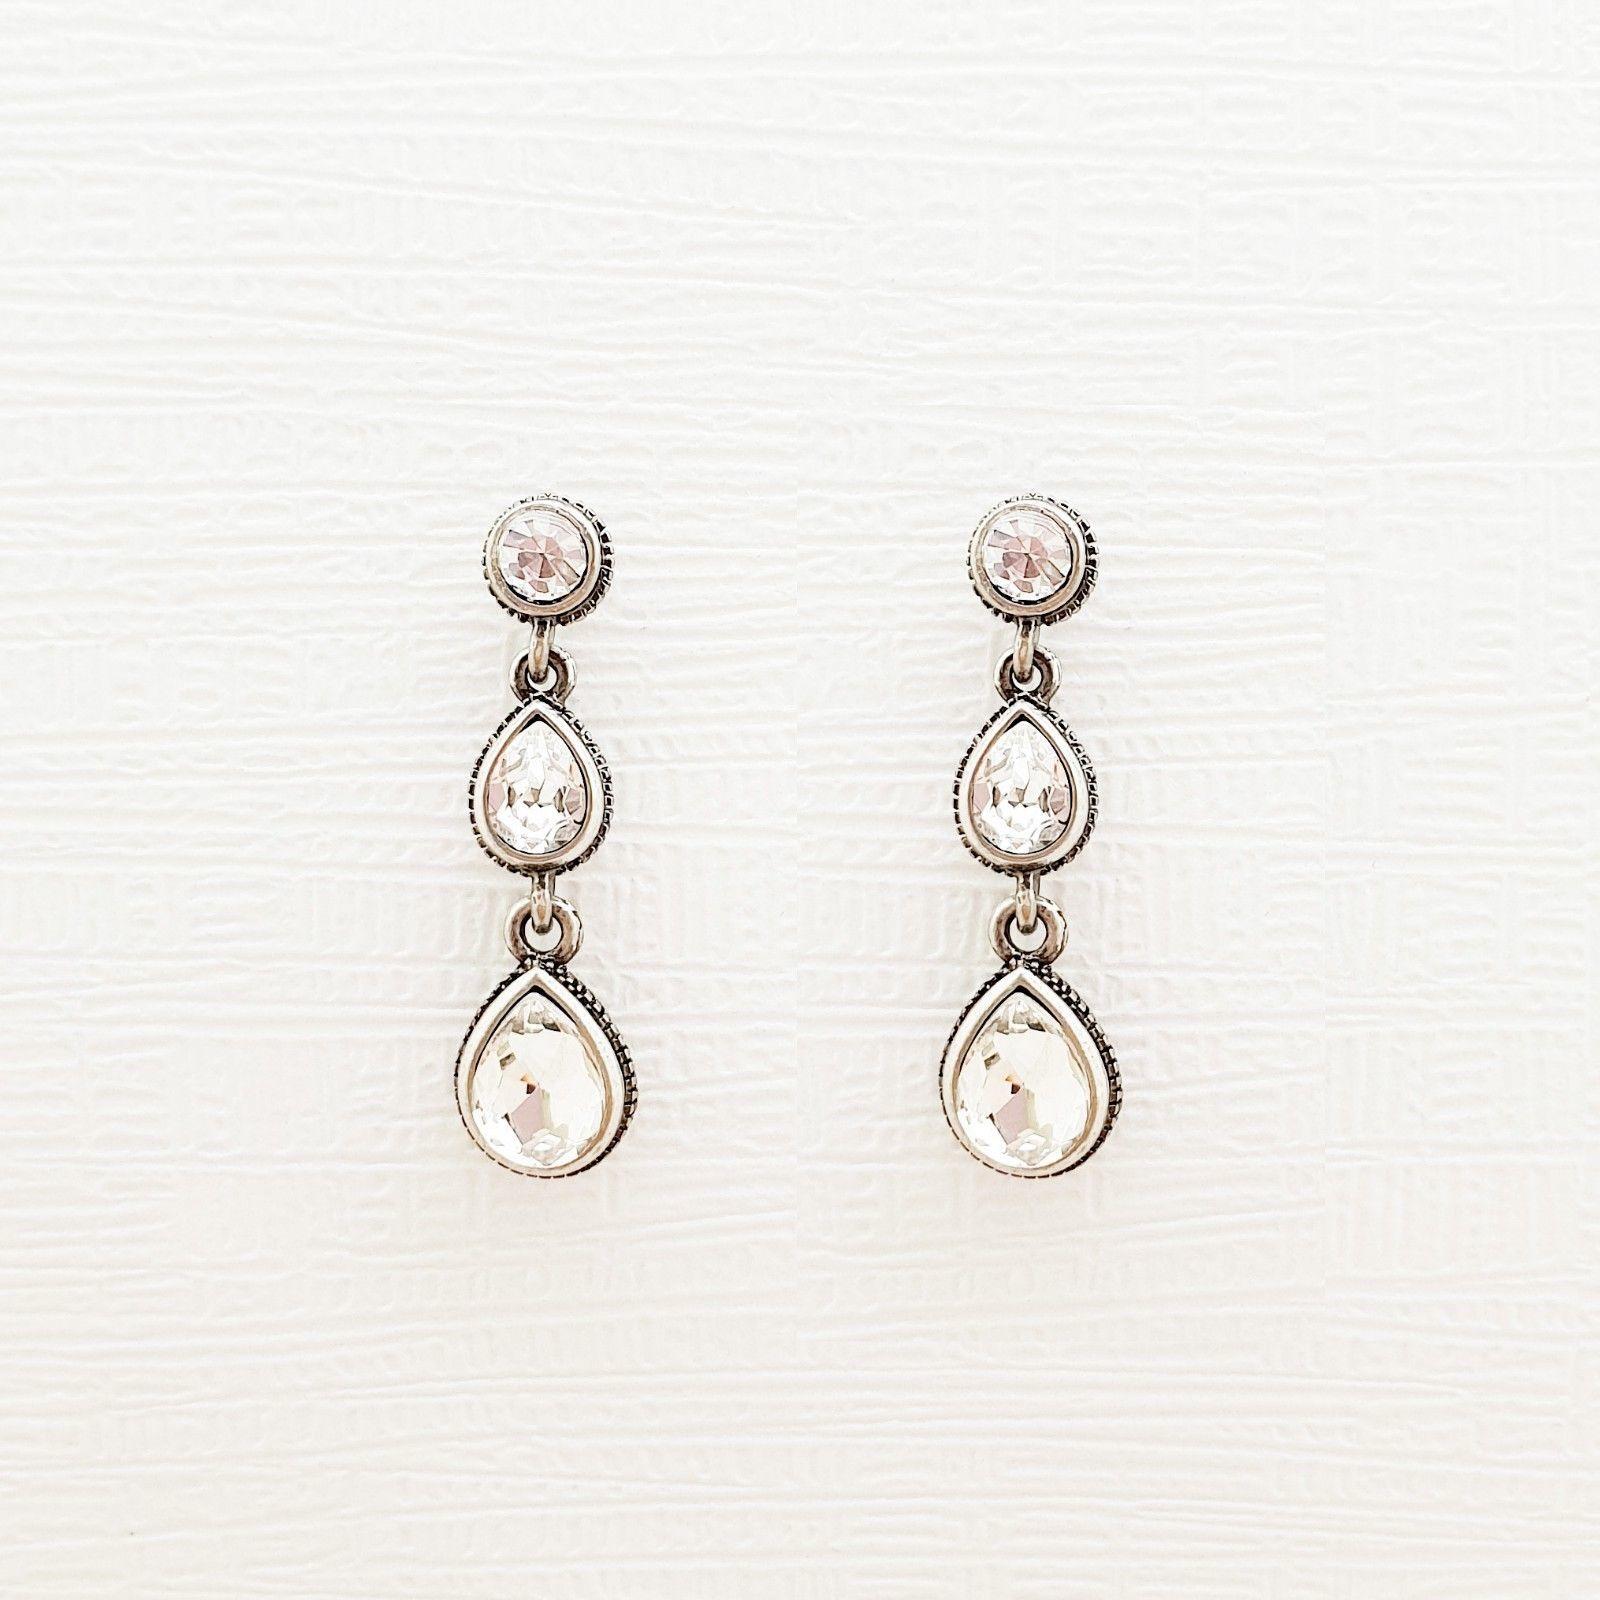 Tiered Round Water Drop Teardrop Shape Made With Swarovski Stone Dangle Earrings image 3